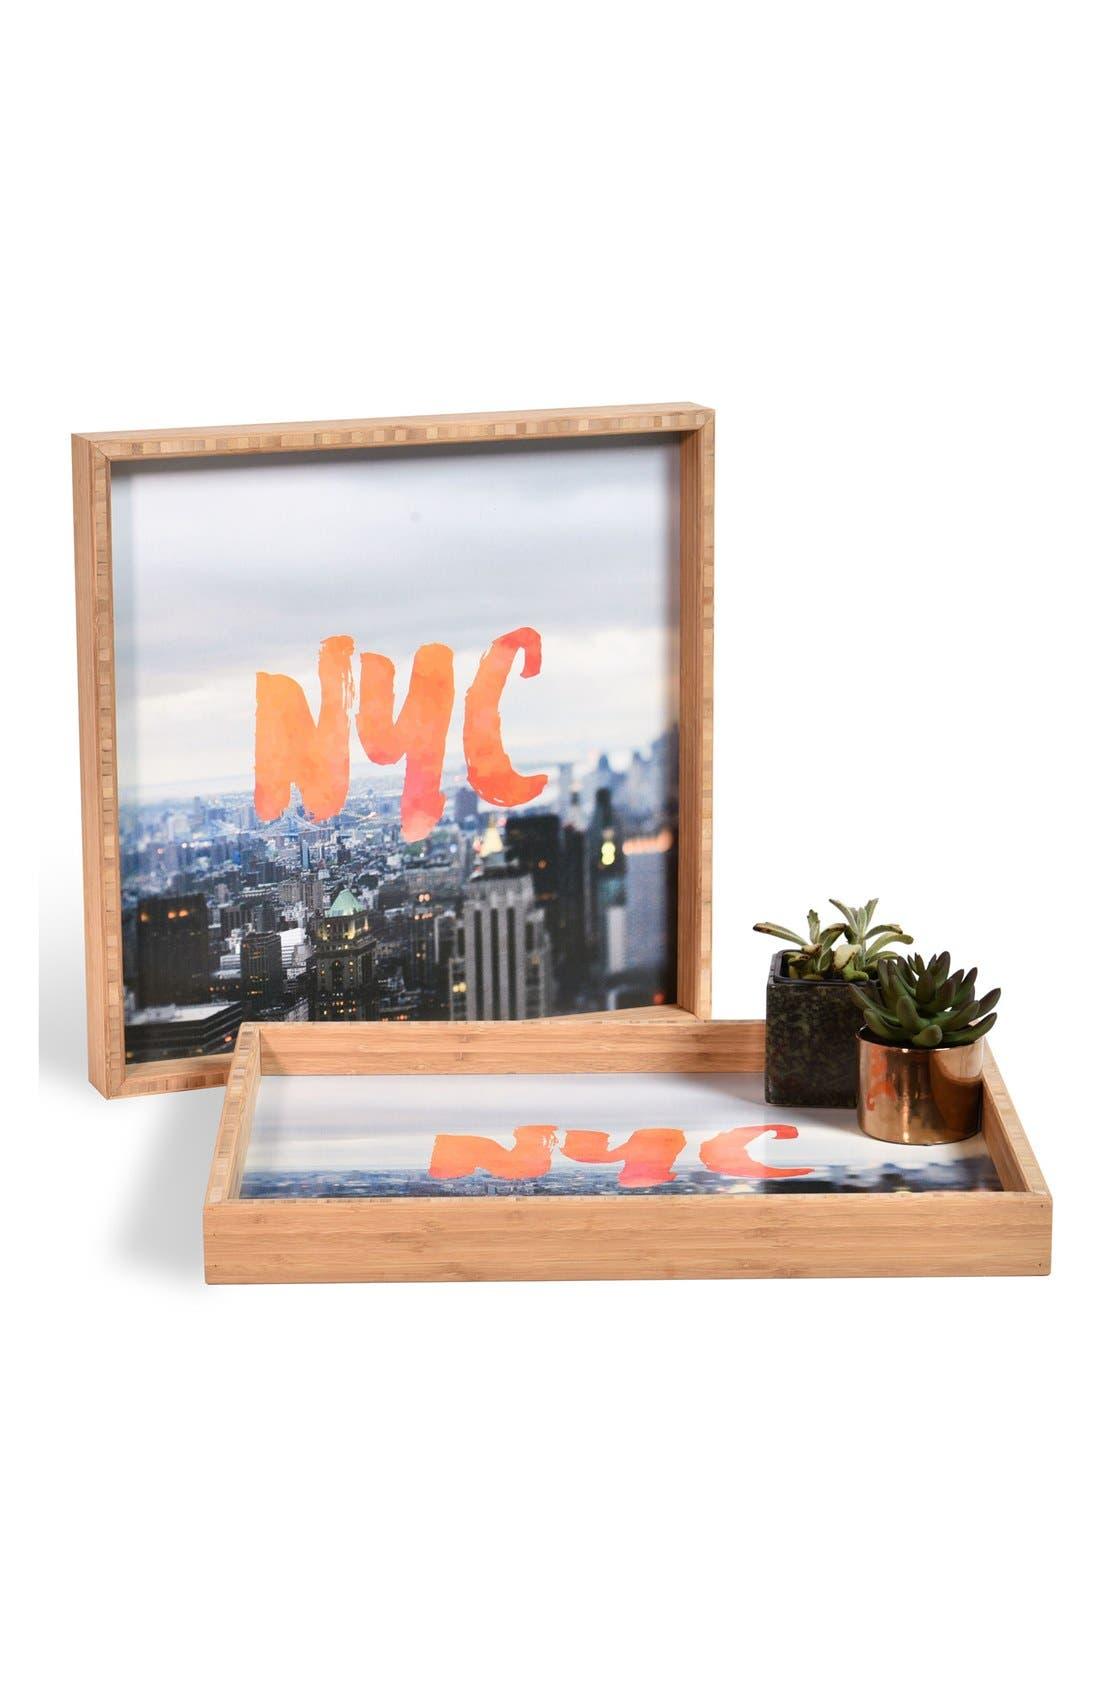 DENY DESIGNS 'NYC Skyline' Decorative Serving Tray